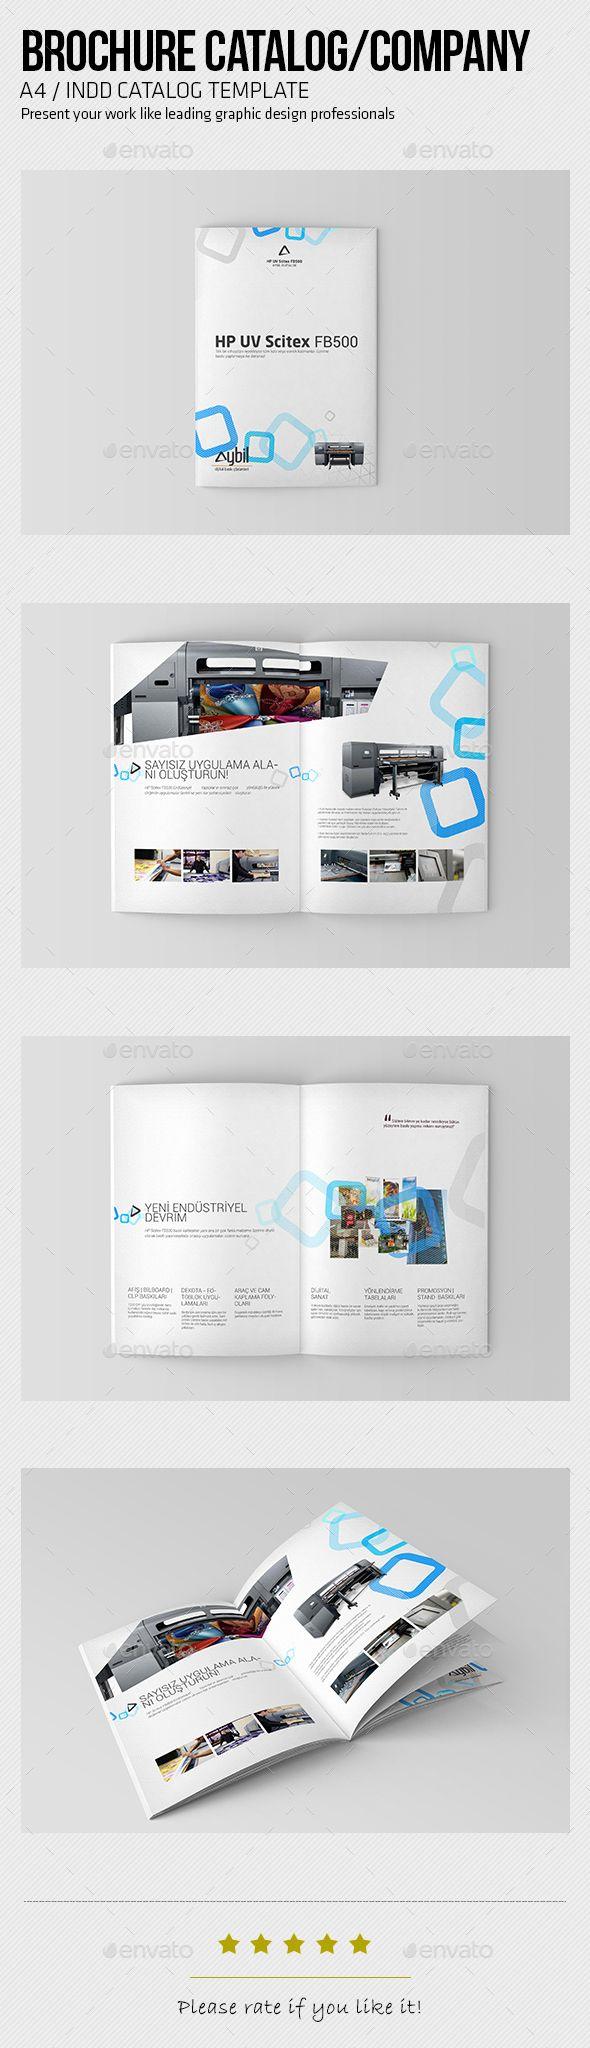 Brochure | Pinterest | Brochures, Brochure template and Indesign ...